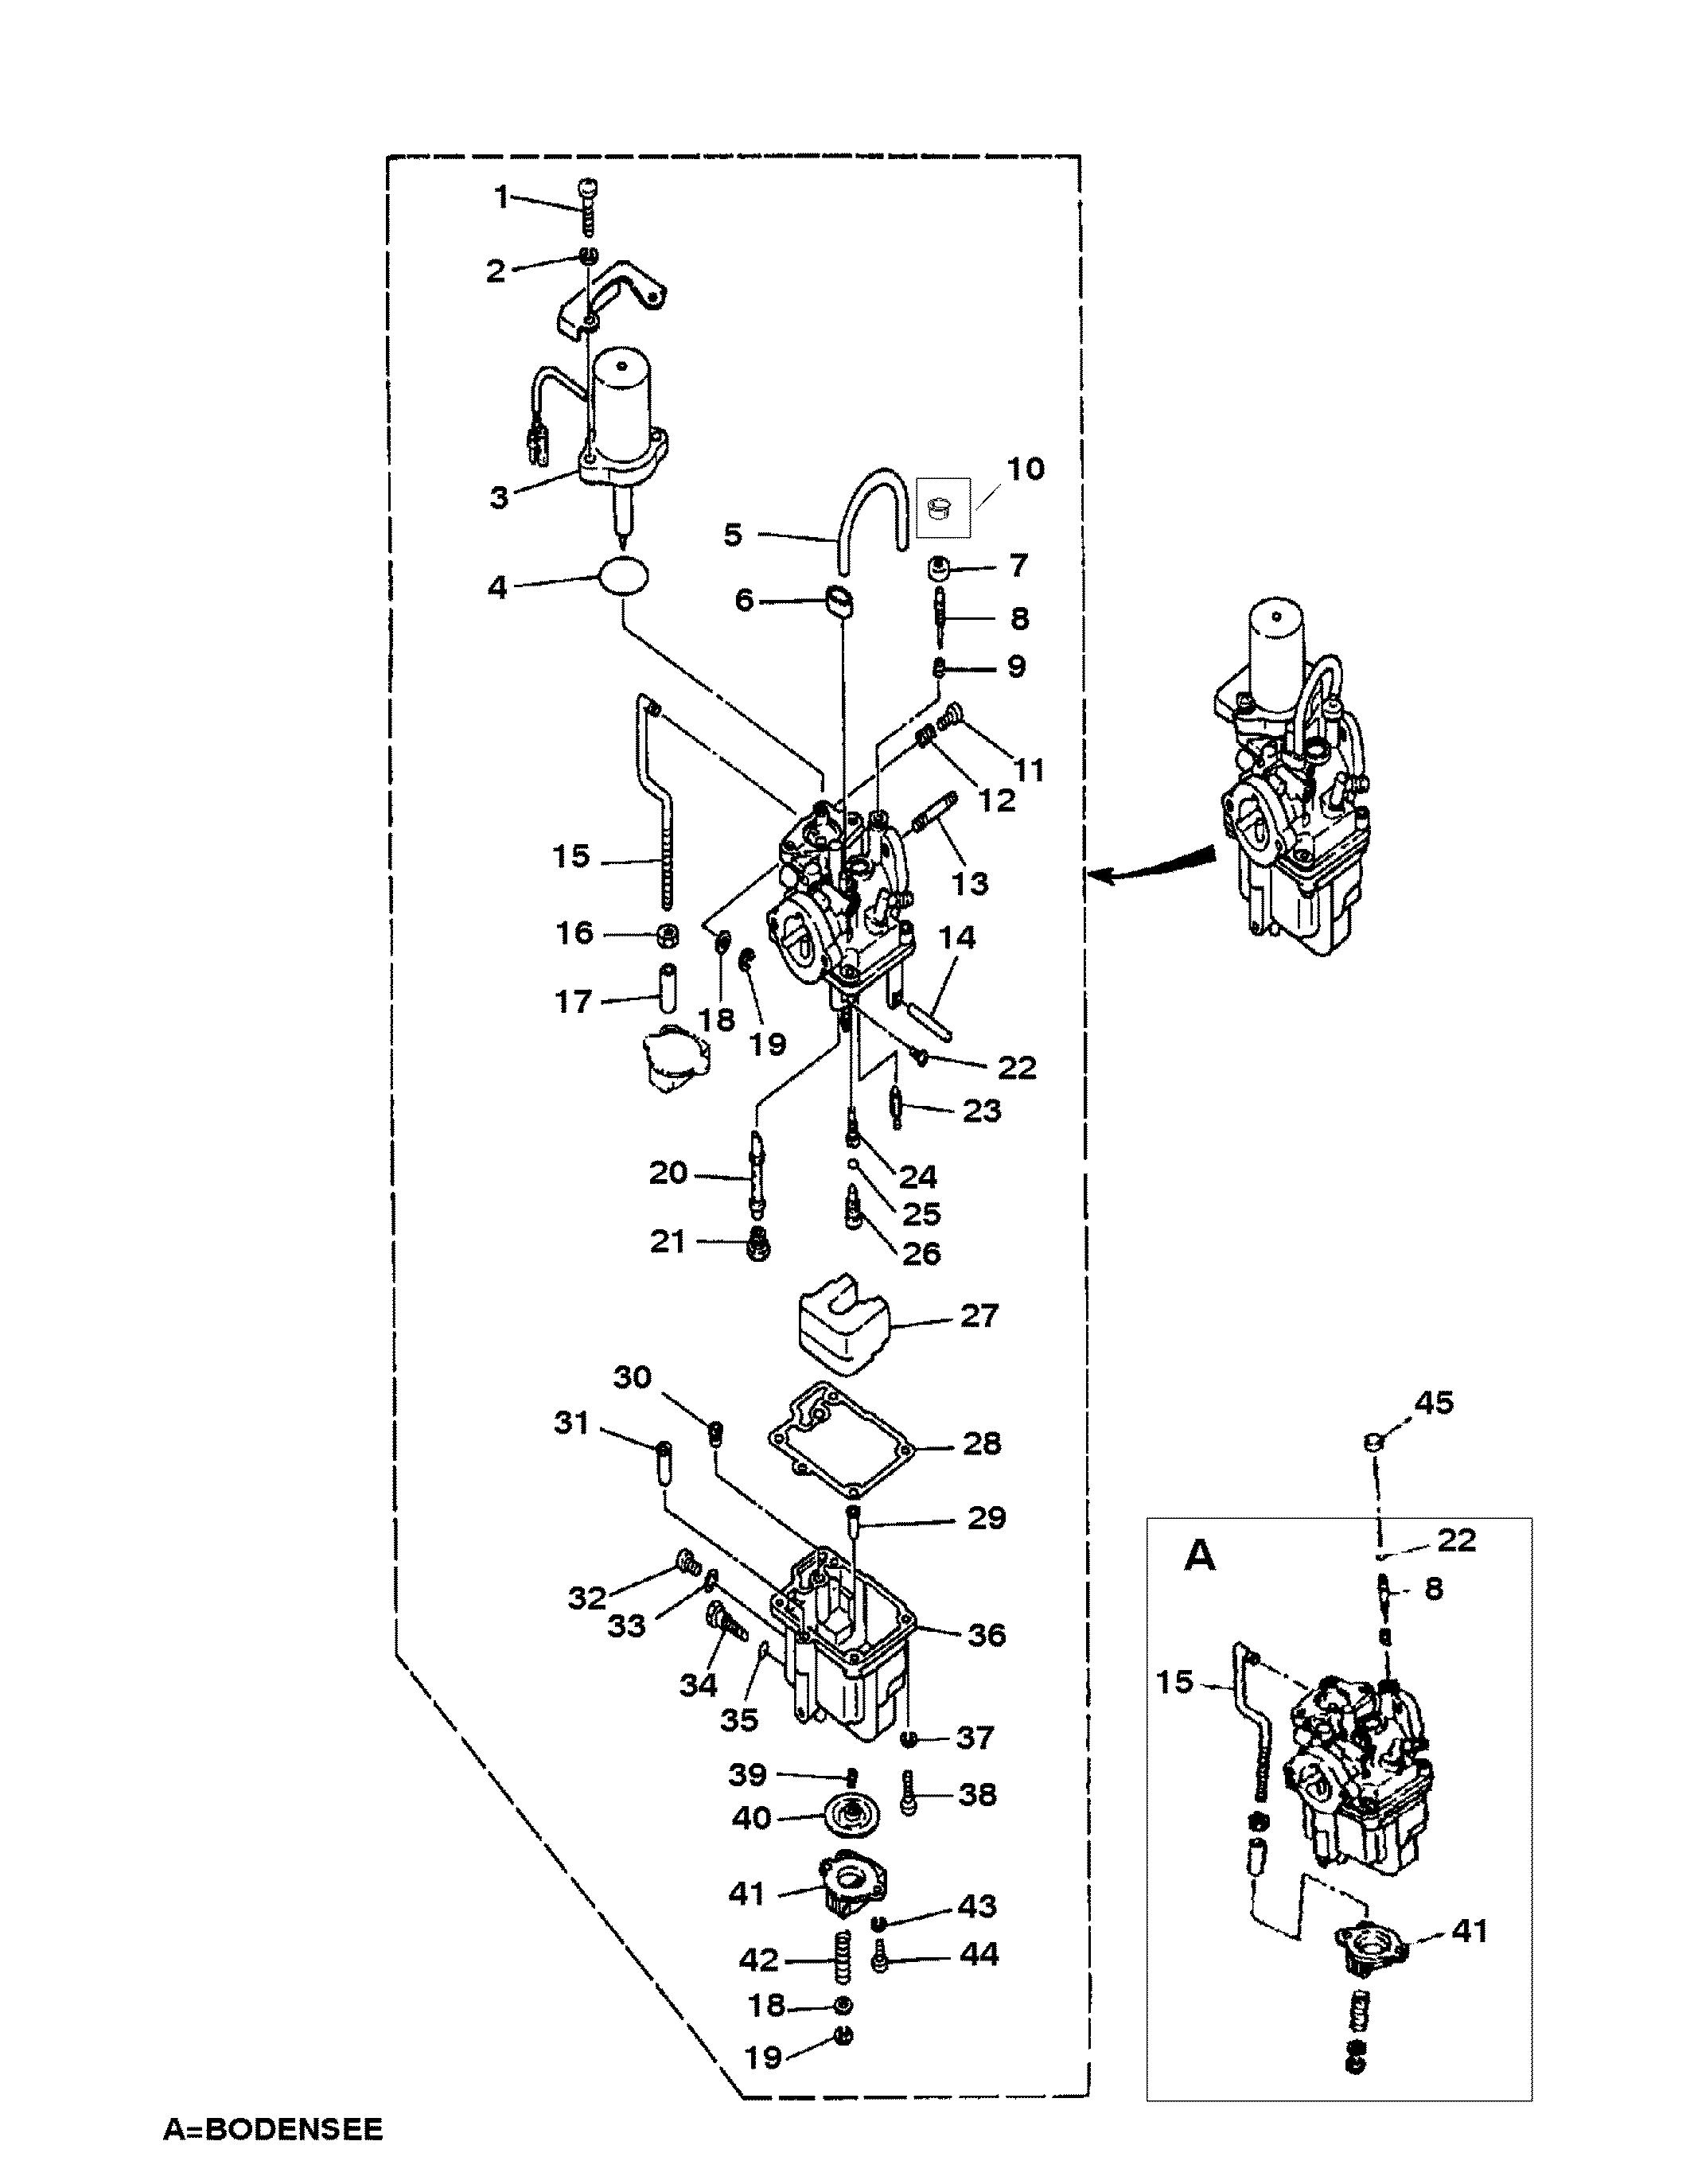 Wiring Diagram Mercury 9 9 4 Stroke - exclusive wiring ... on